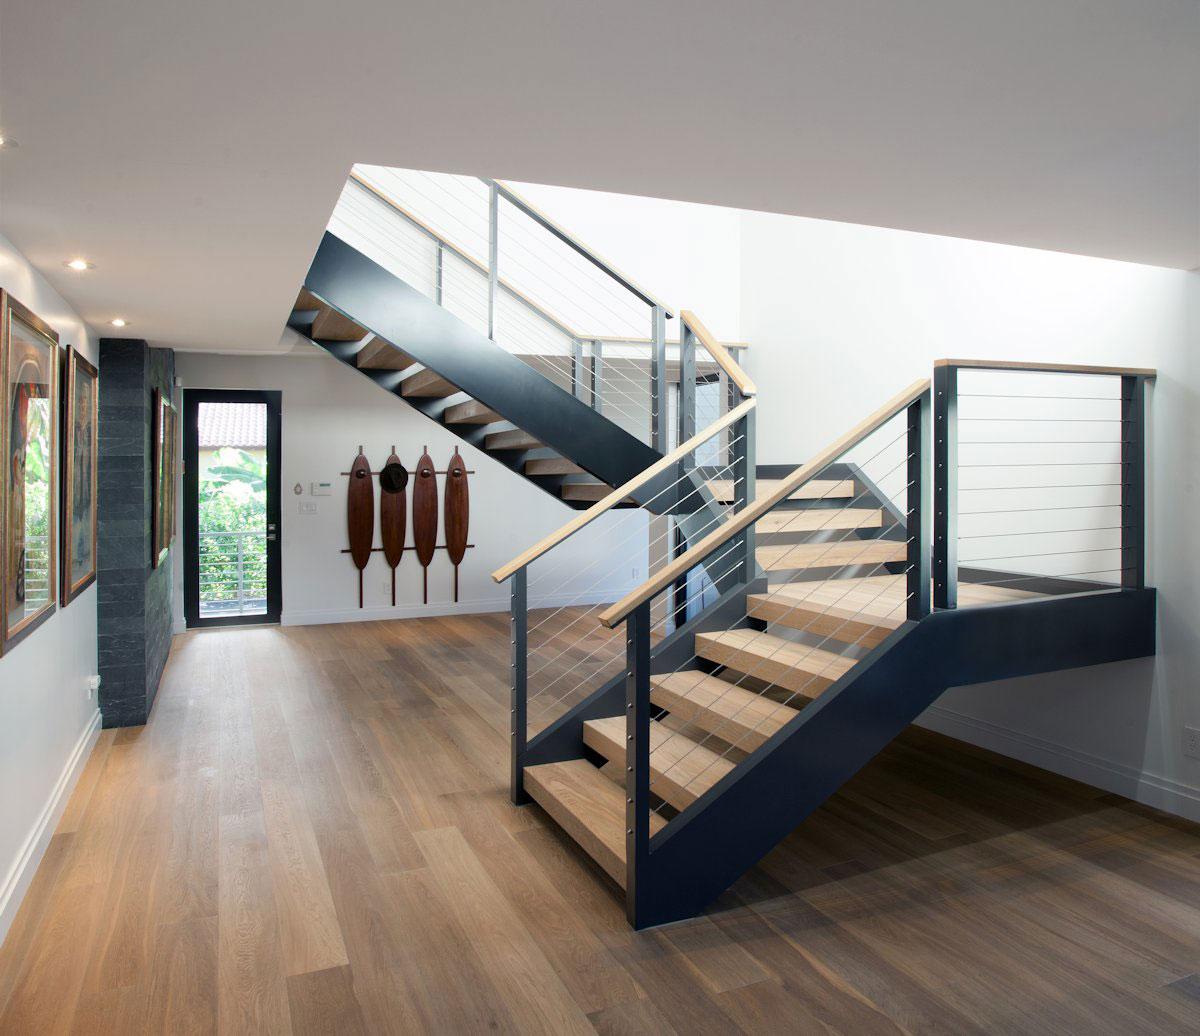 Metal & Wood Stairs, Modern Retreat in Davie, Florida